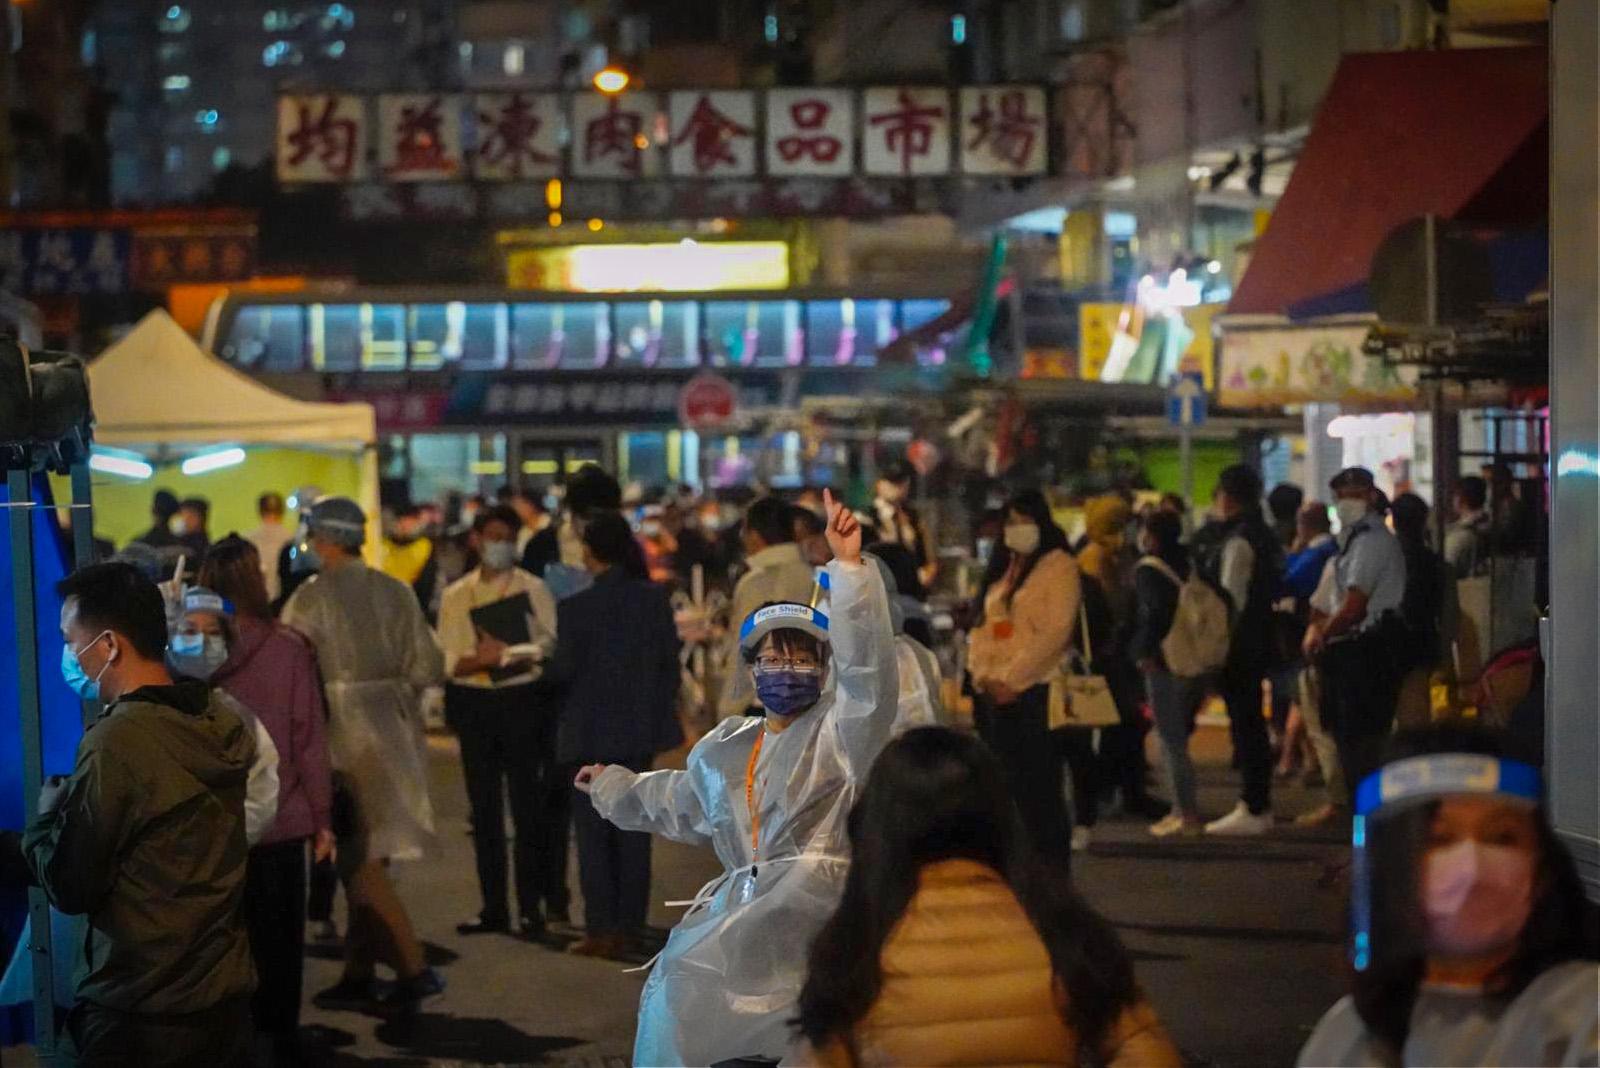 Sham Shui Po lockdown